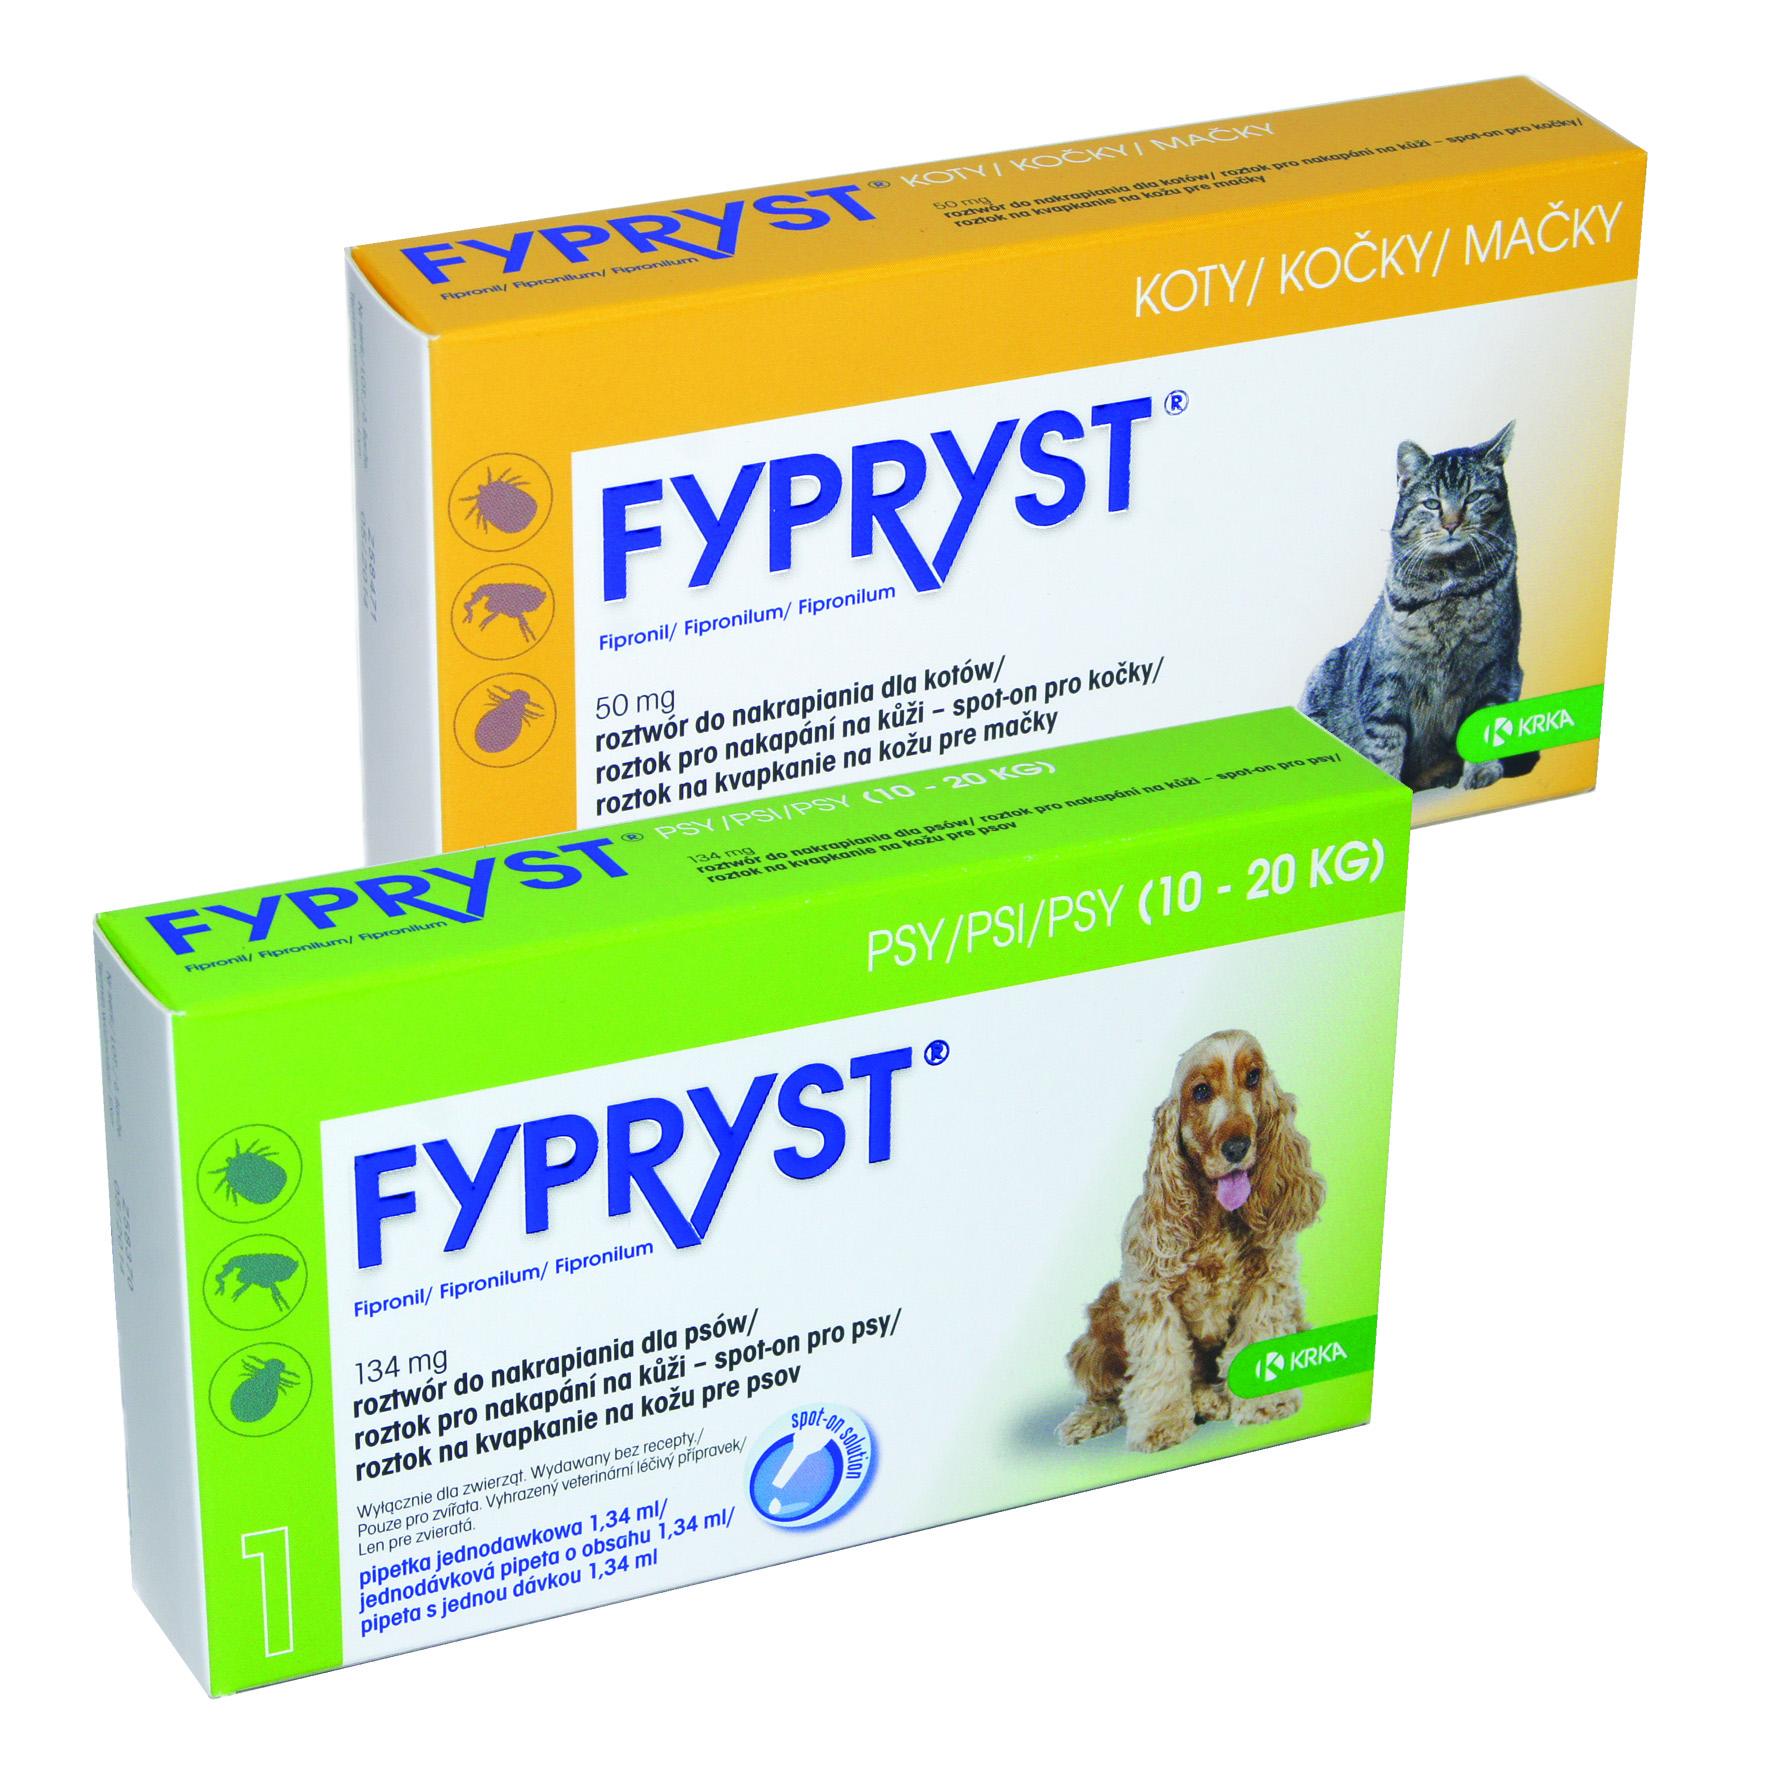 fypryst-1pipetaCAT,DOG